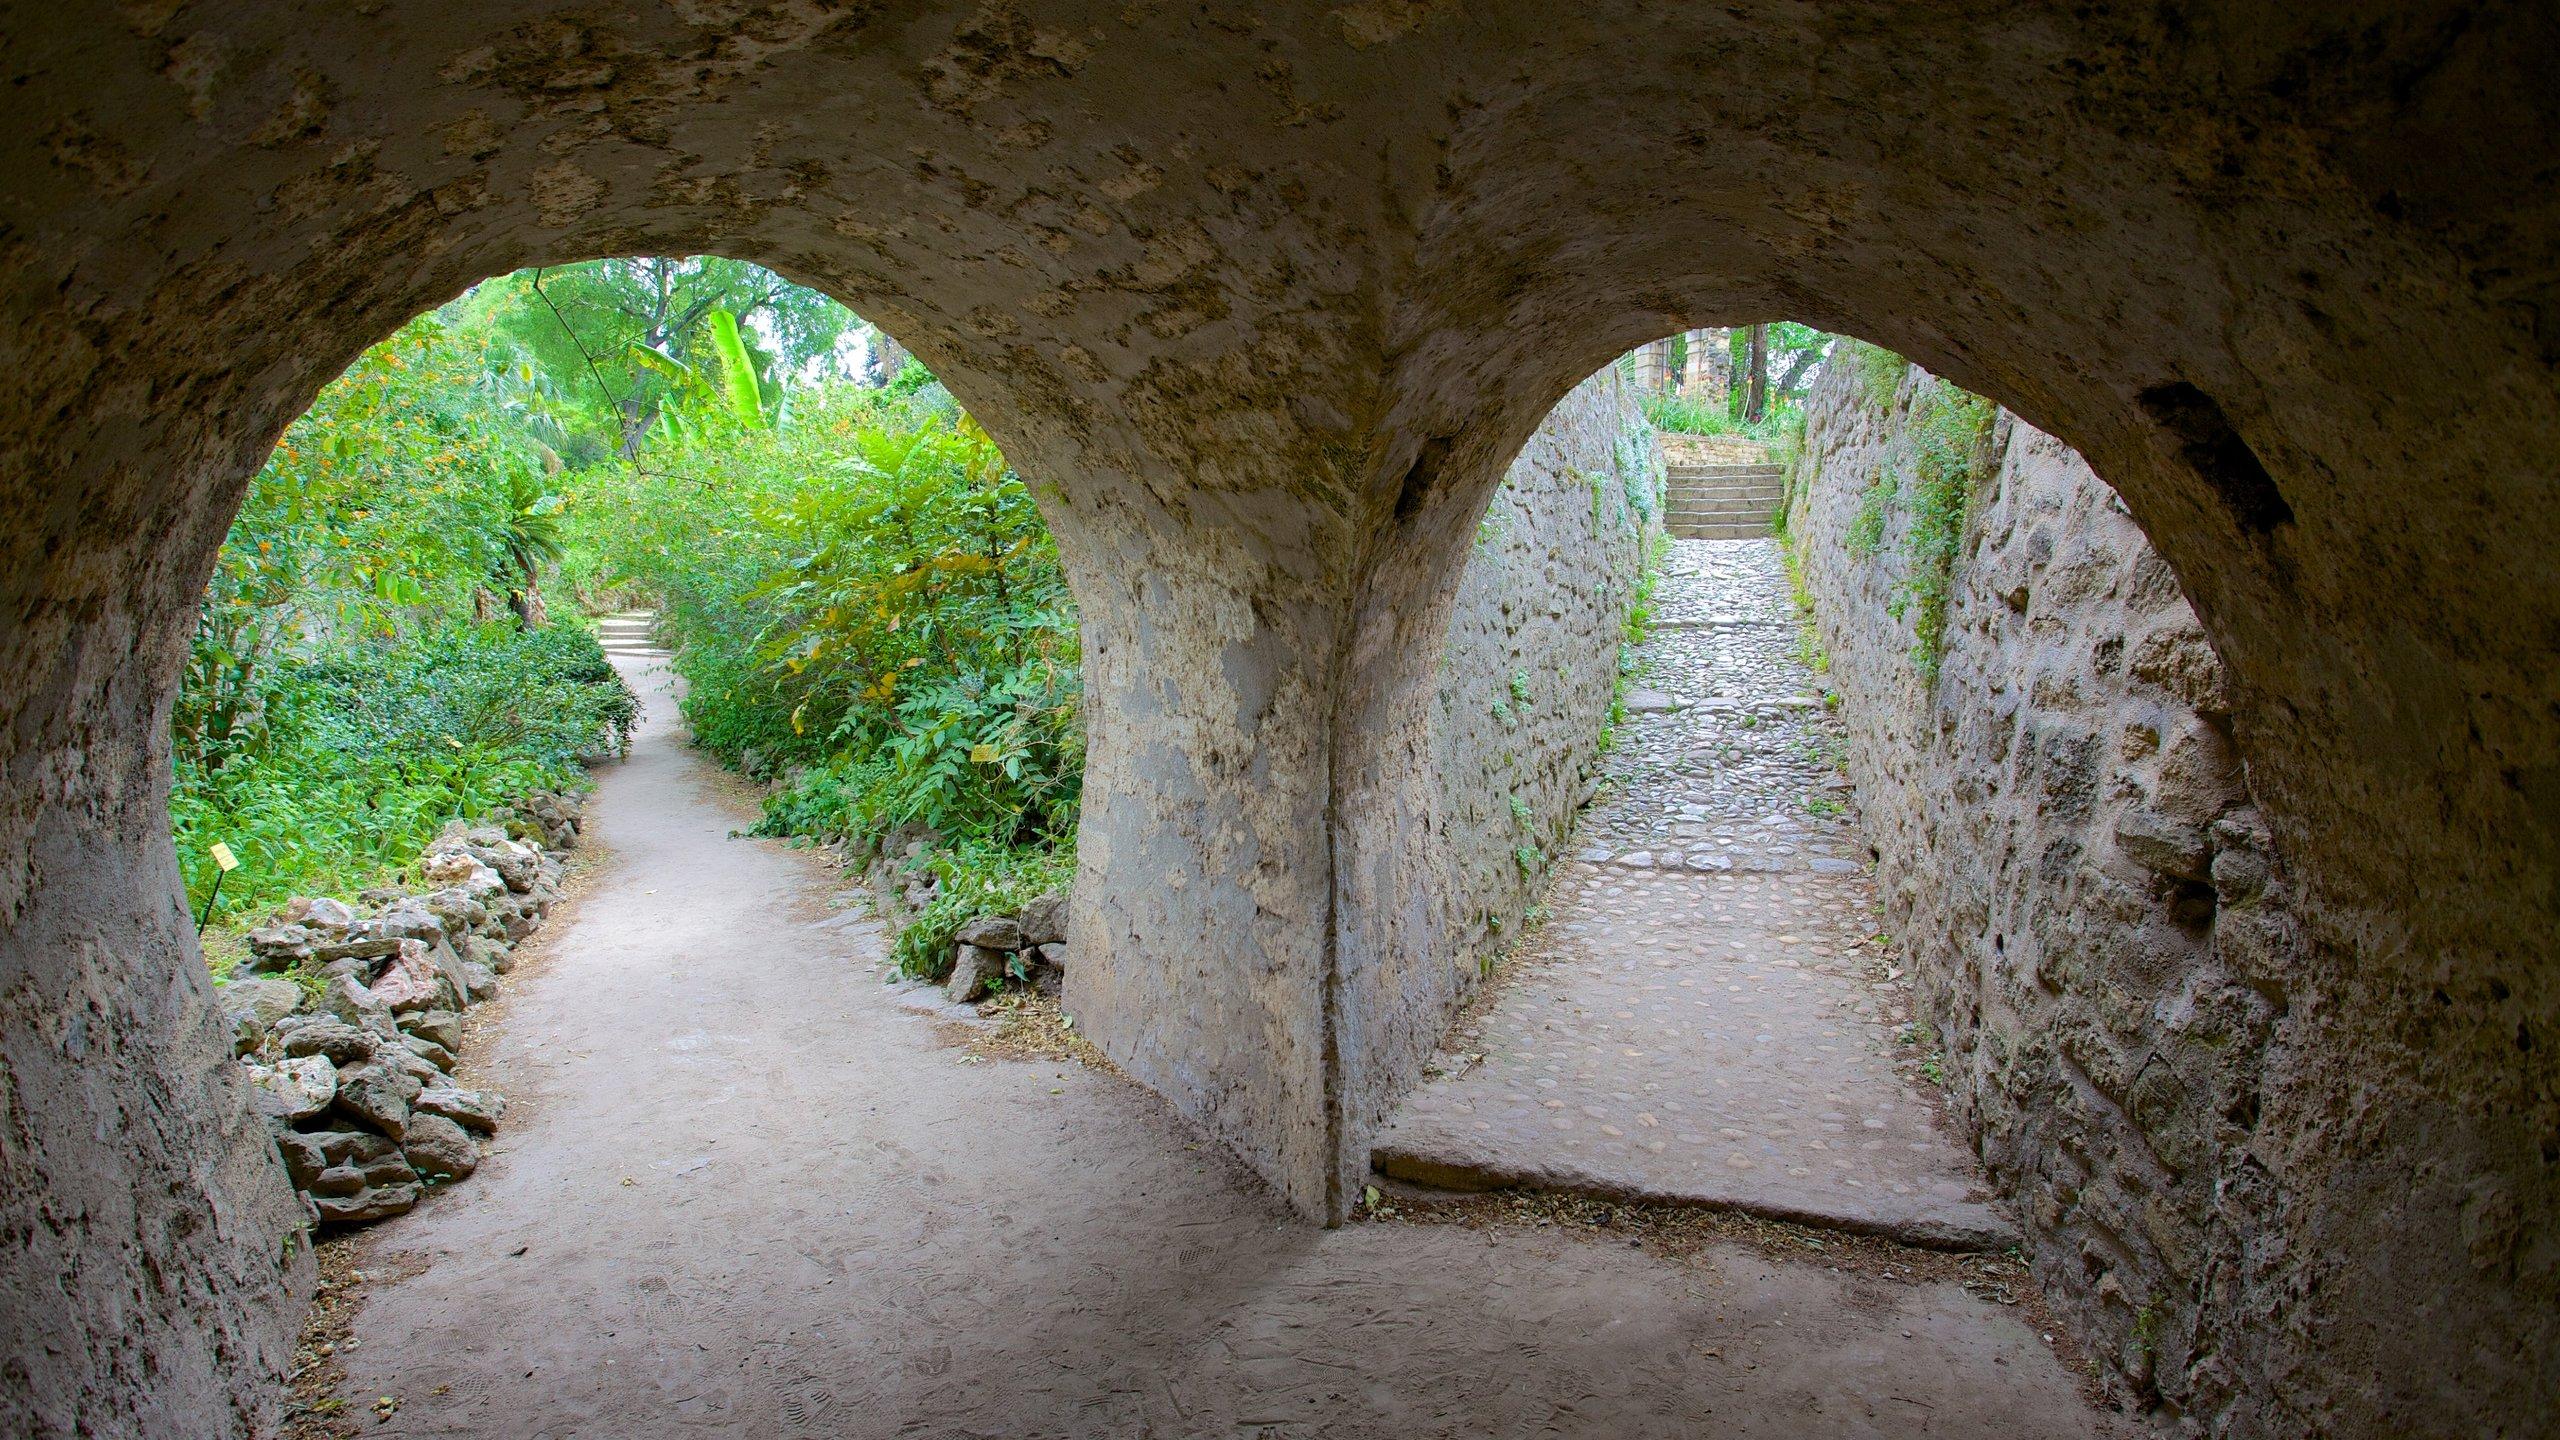 Ogród botaniczny w Montpellier, Montpellier, Hérault (departament), Francja